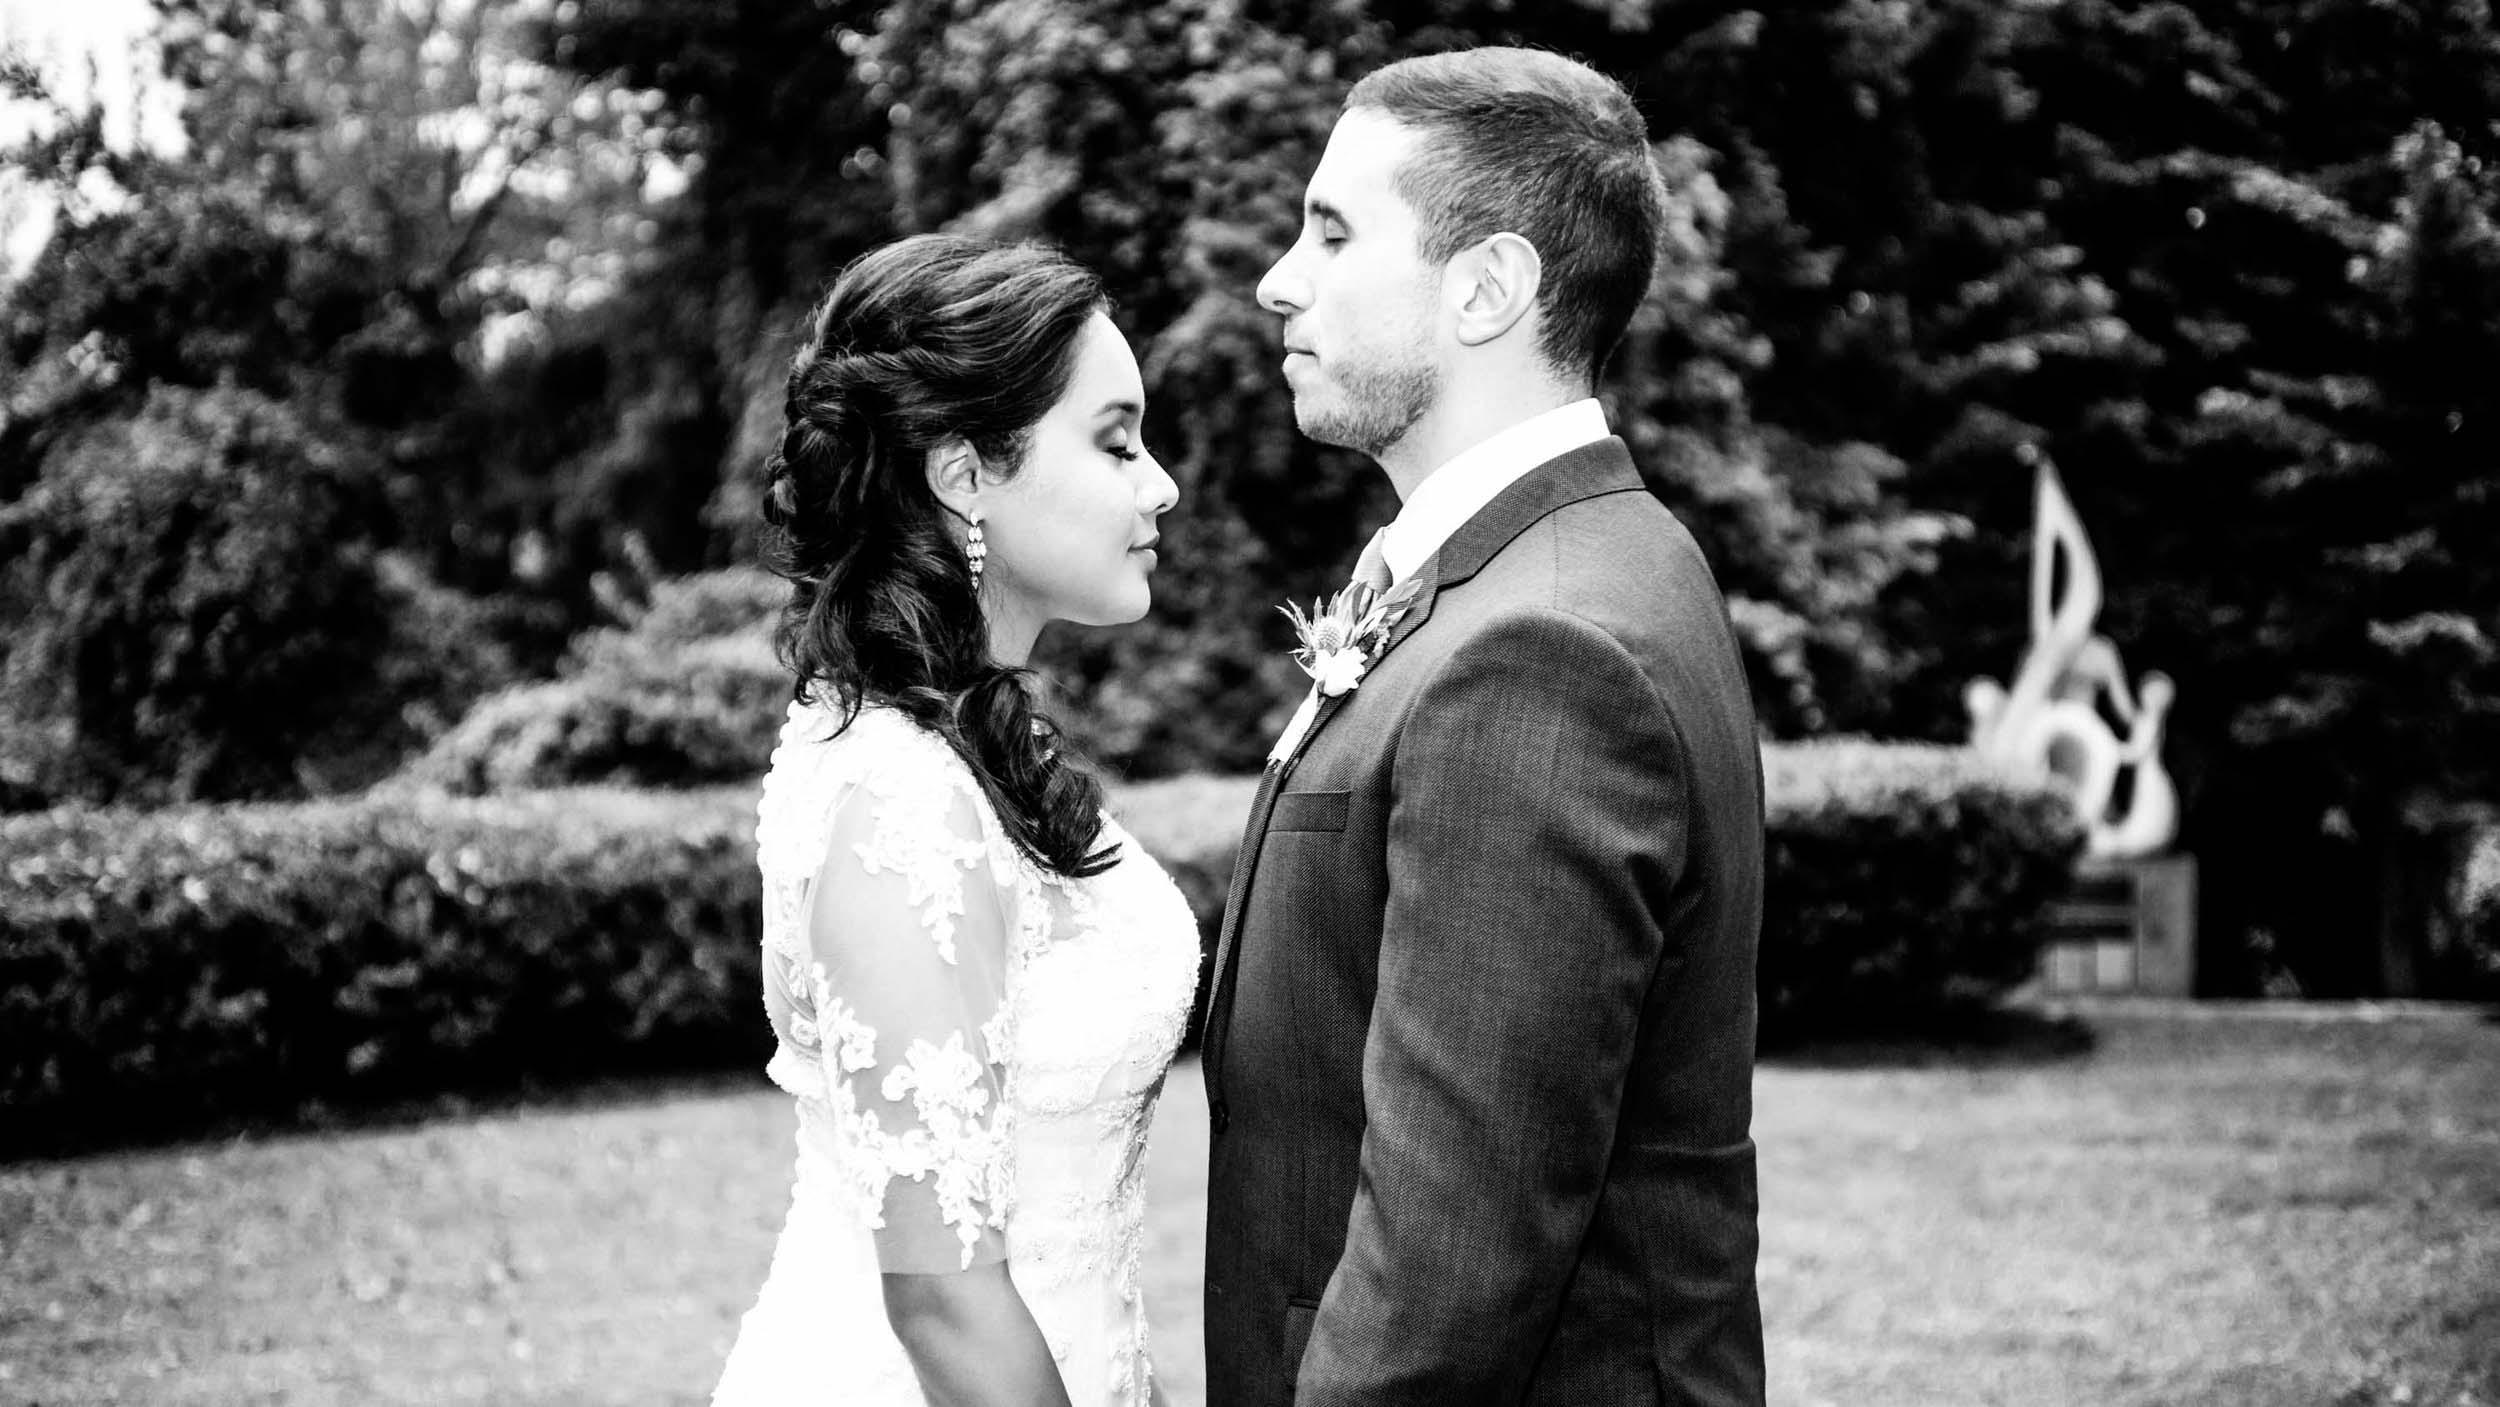 dc+metro+wedding+photographer+vadym+guliuk+photography+wedding+bride+and+groom-2047.jpg